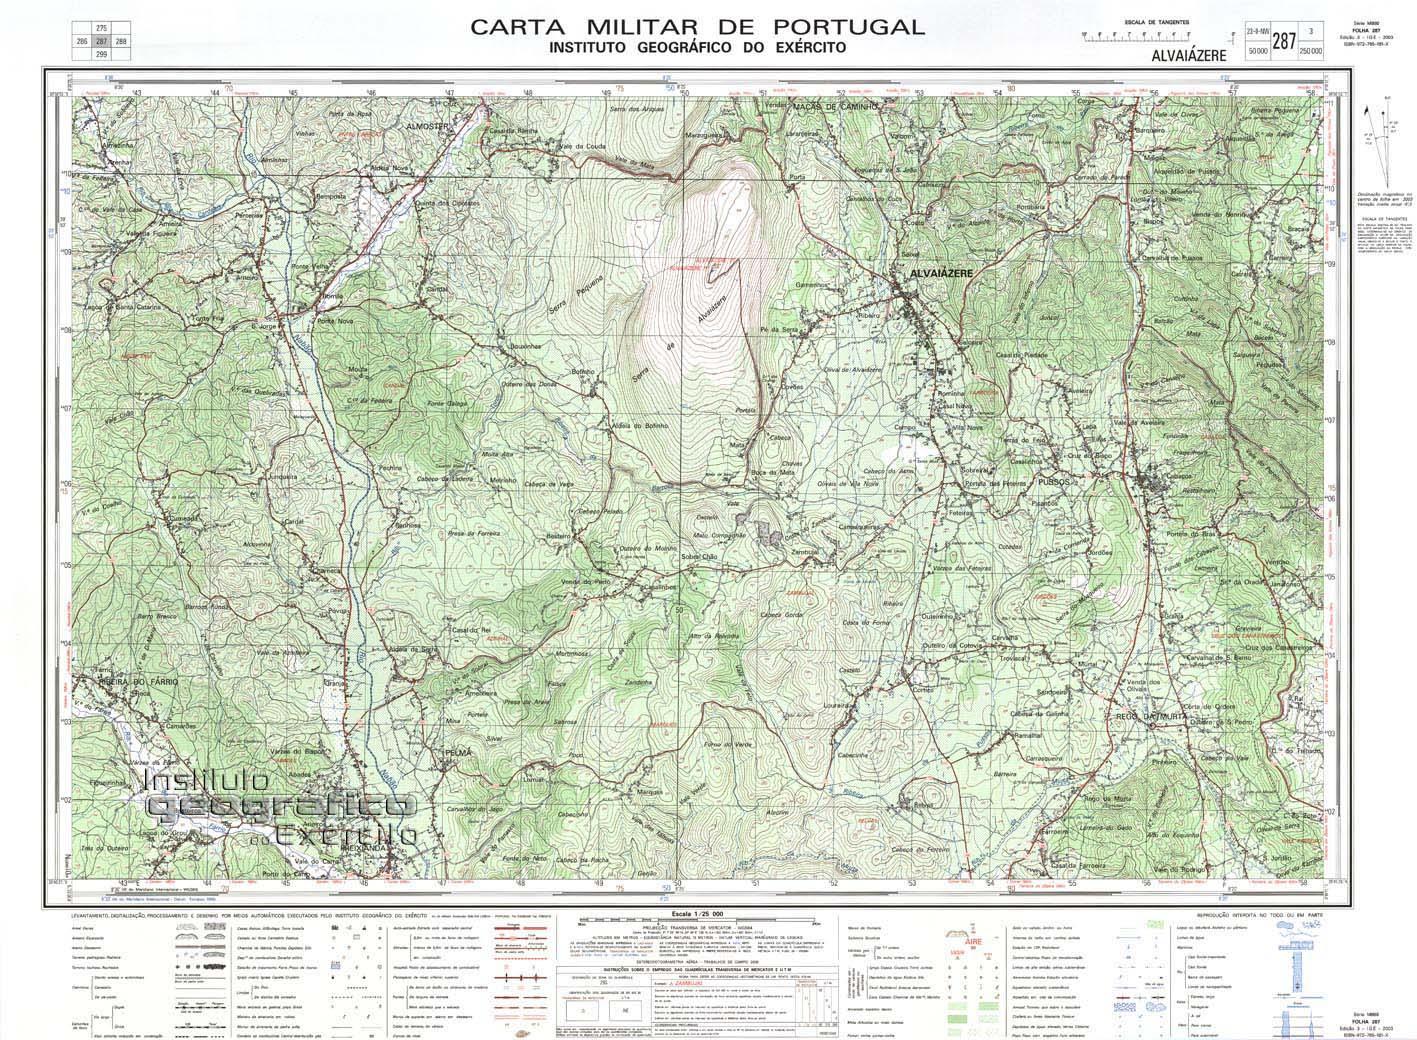 mapa militar portugal Mataspeak: Carta militar à escala 1:25000 mapa militar portugal